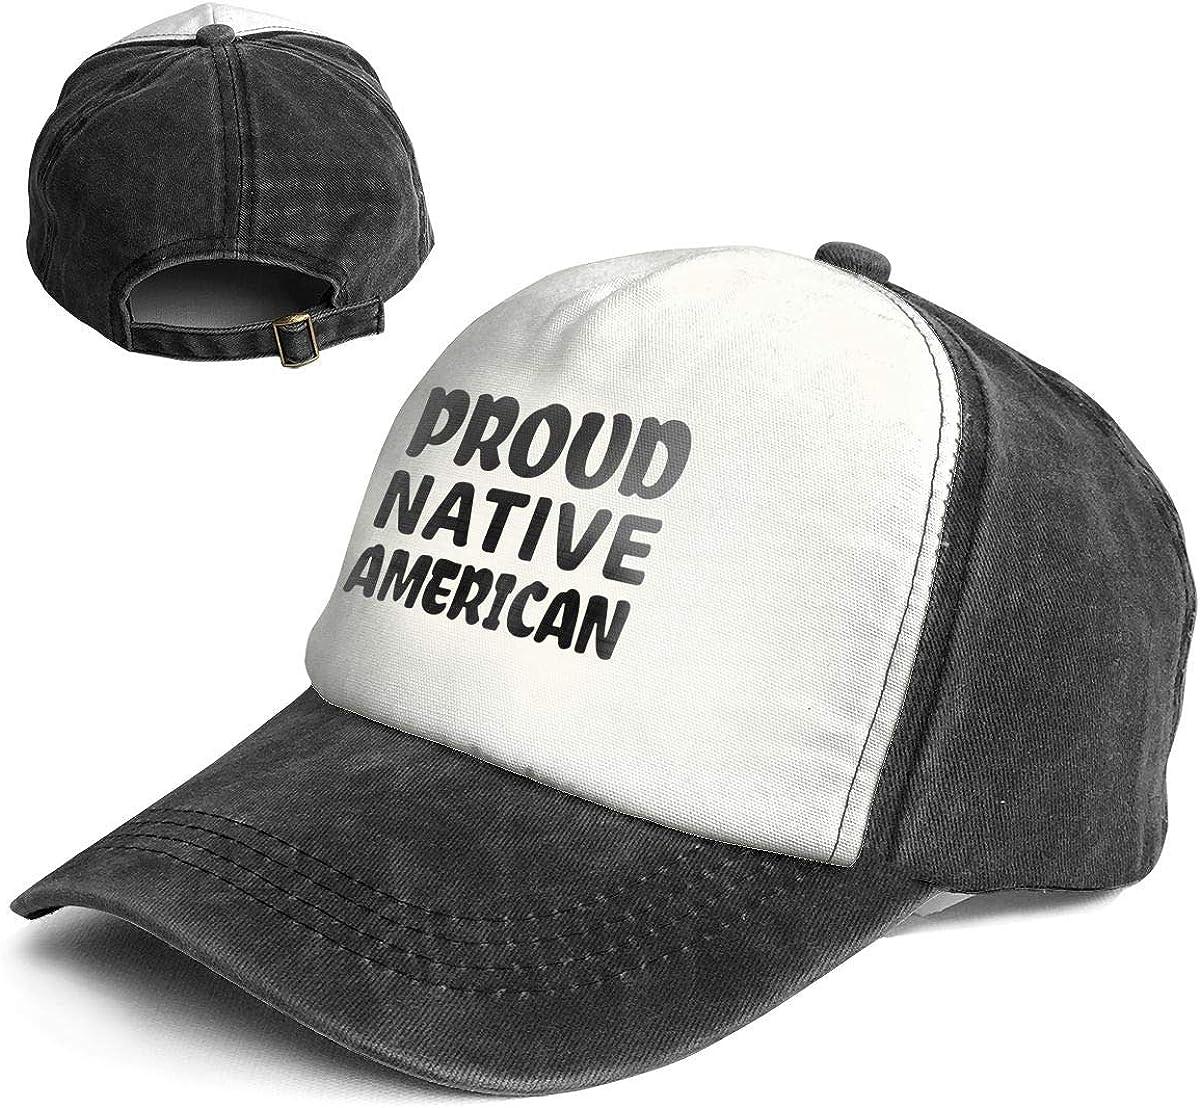 Fashion Vintage Hat Proud Native American Adjustable Dad Hat Baseball Cowboy Cap